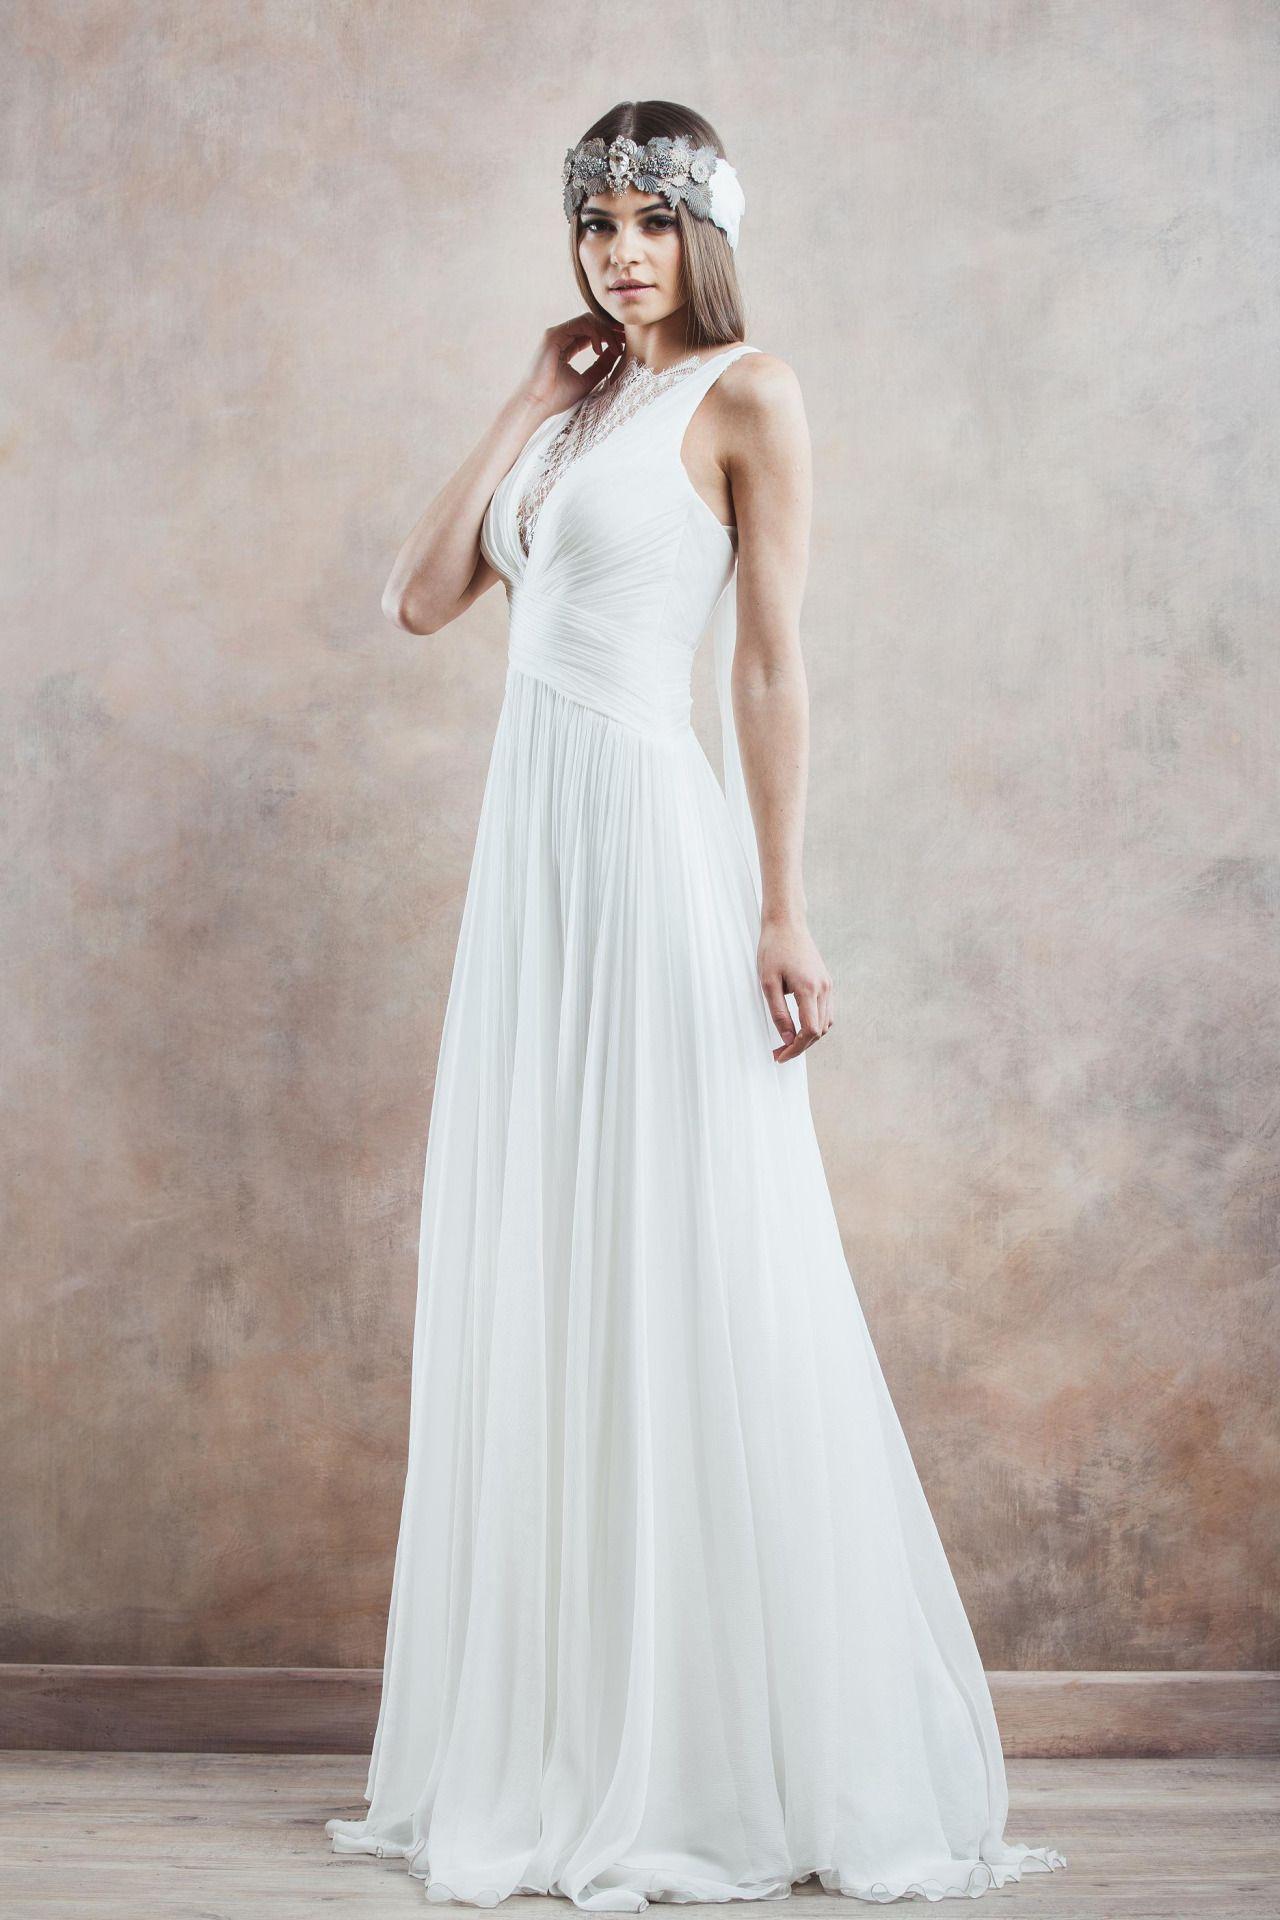 1d8fe21d4ce9 Ophelia wedding dress, 2014 Collection, Divine Atelier   Wedding ...